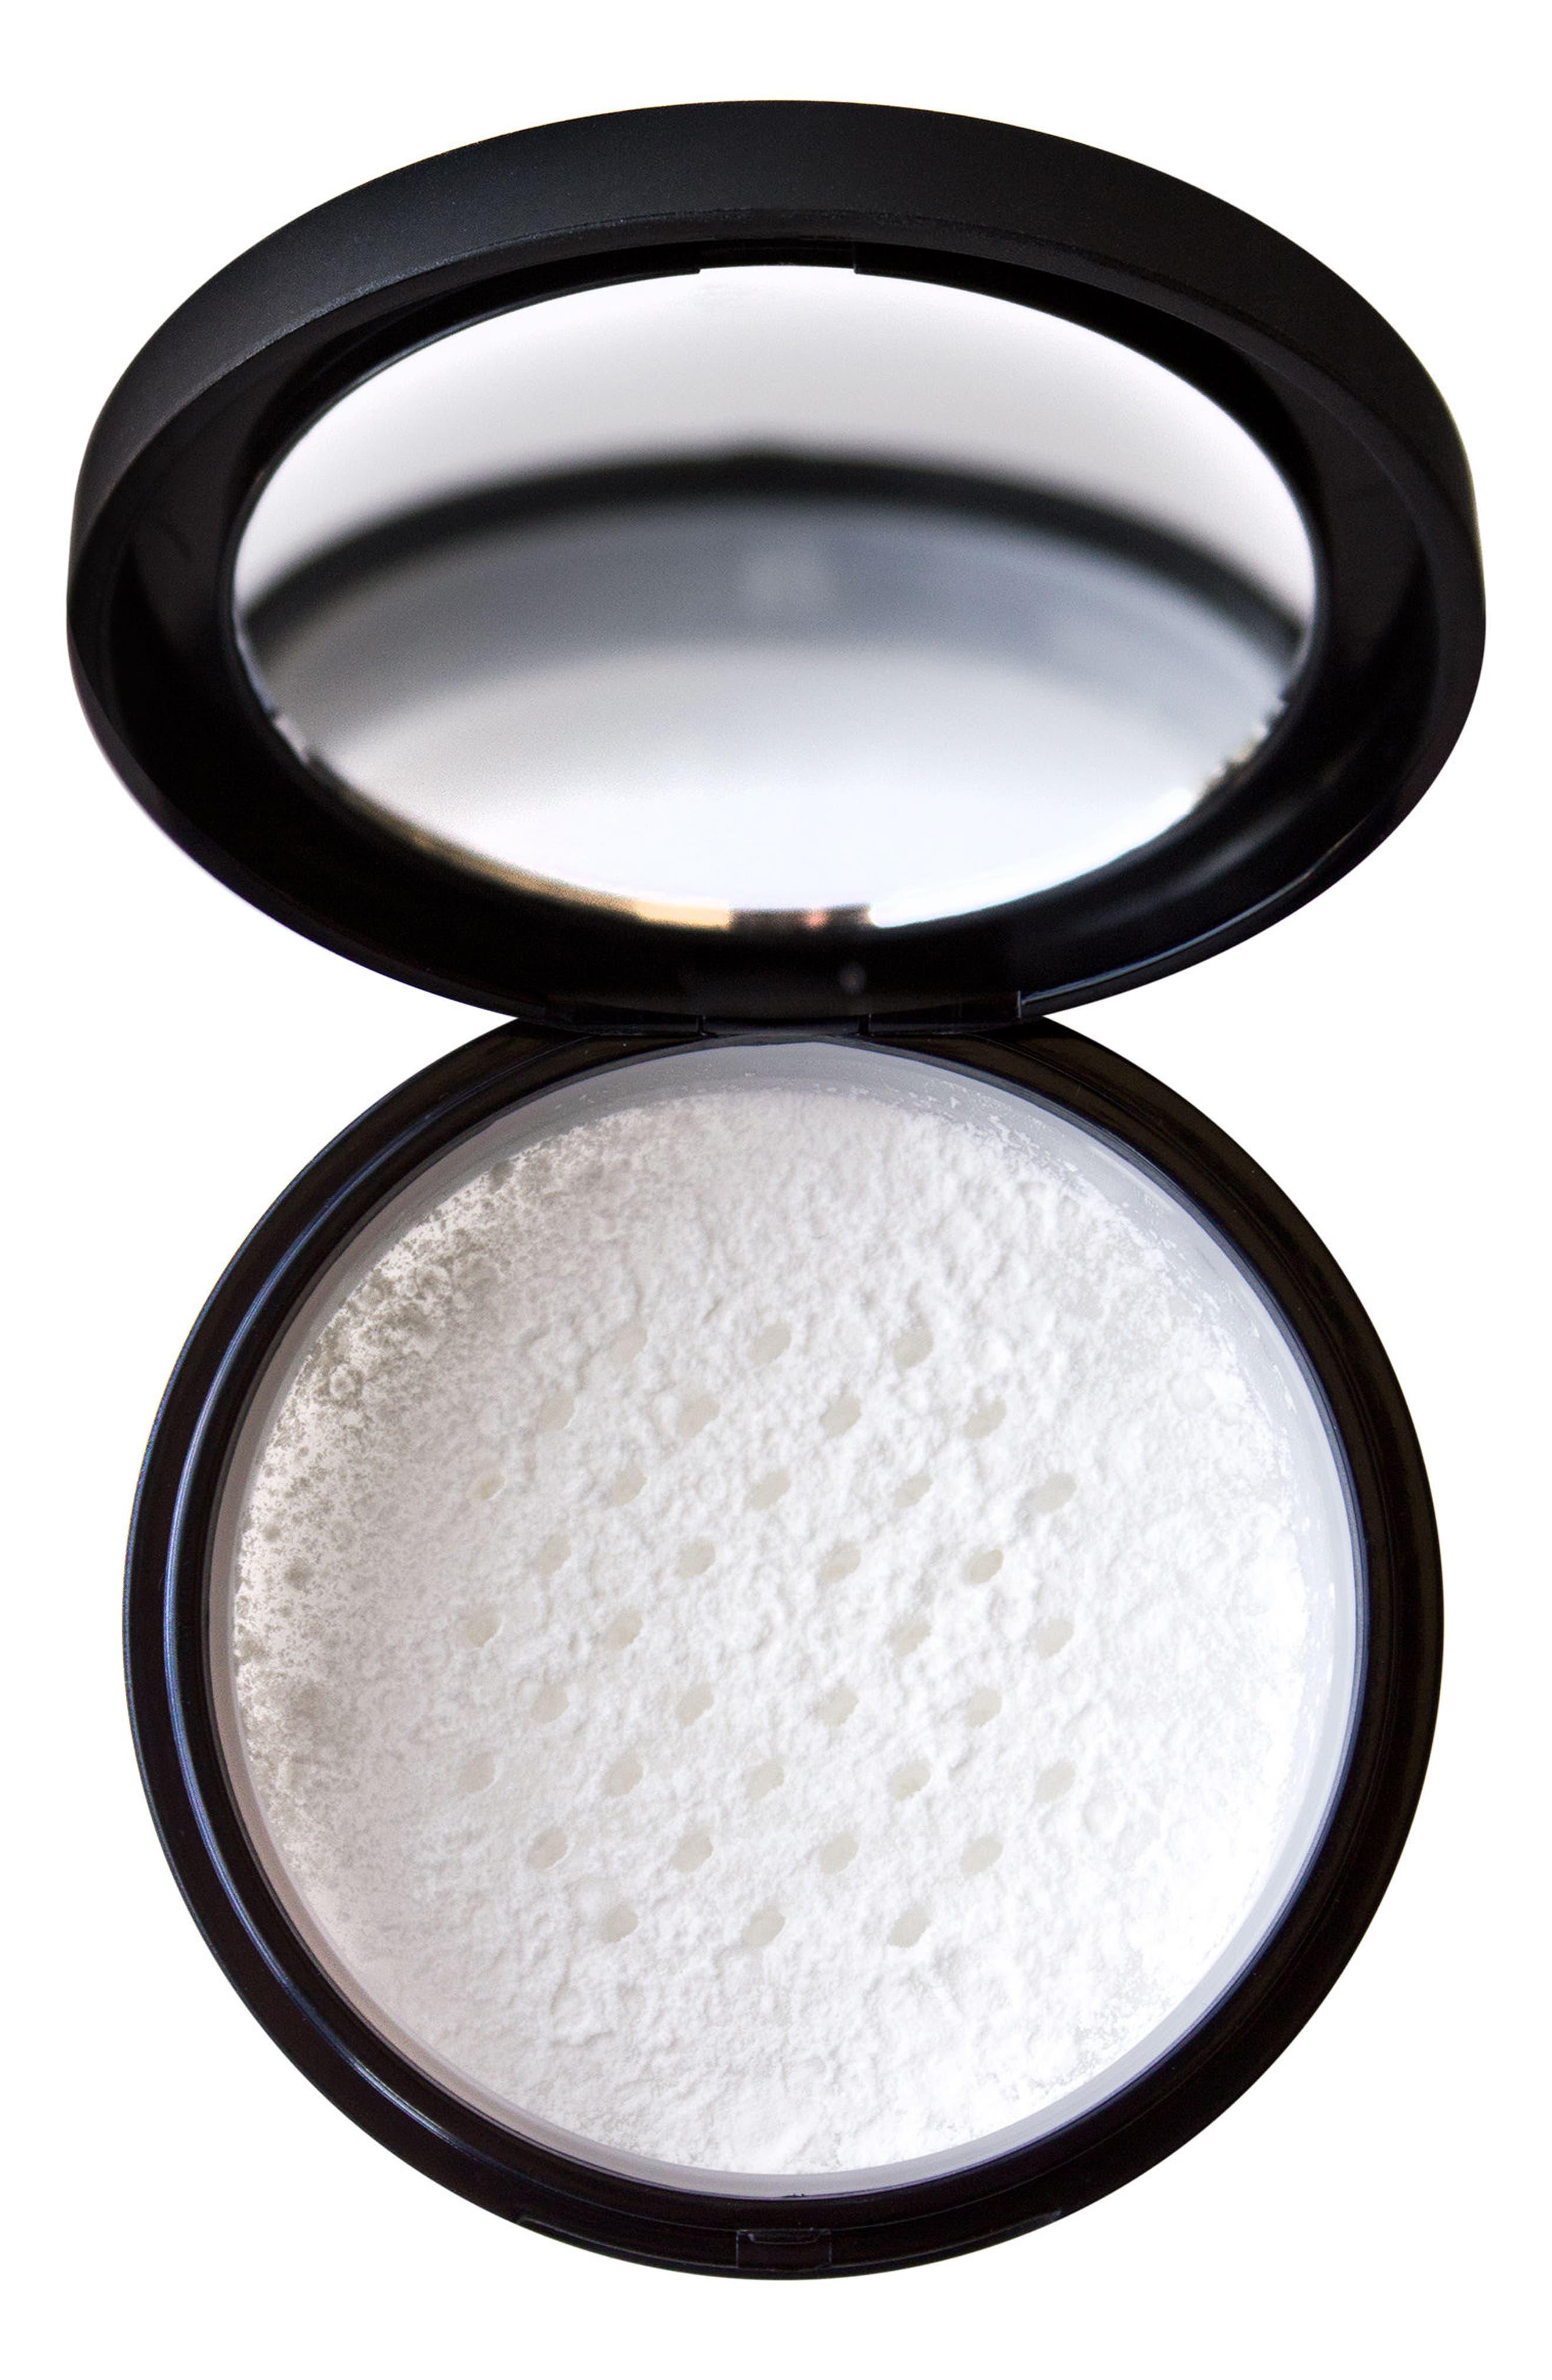 LORAC PRO Blurring Translucent Loose Powder